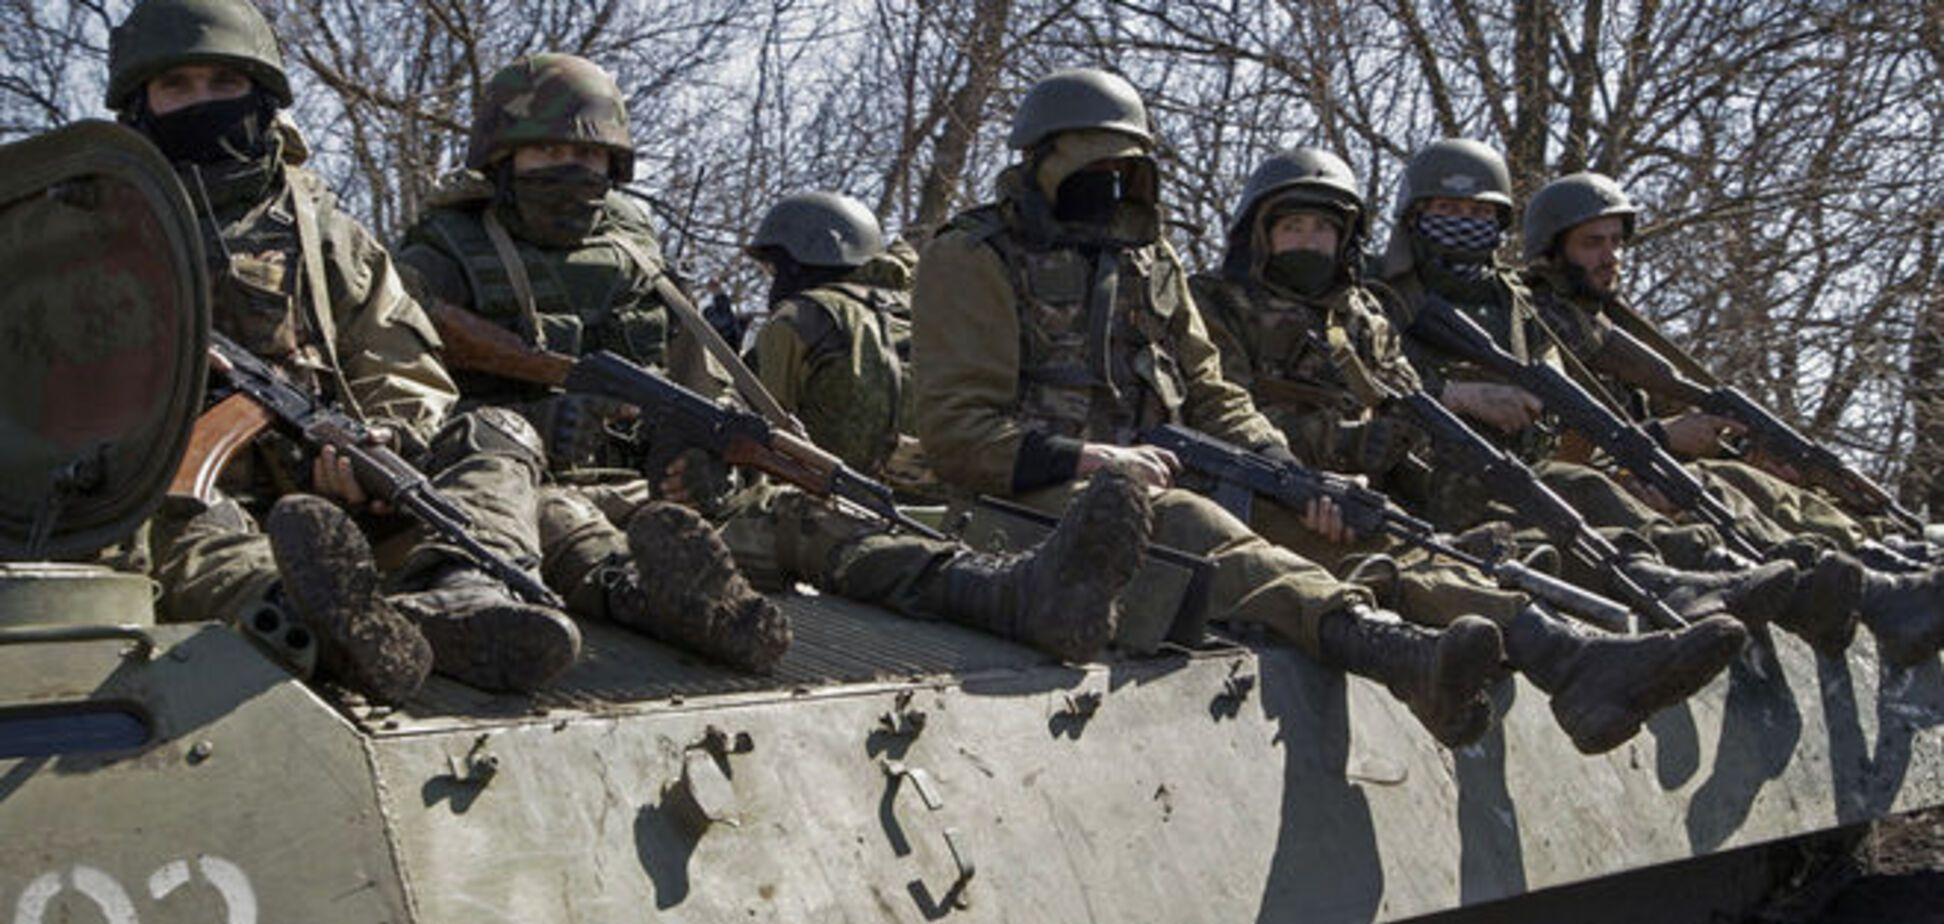 Боевики на Донбассе 'собирают дань' под видом бойцов АТО - журналист